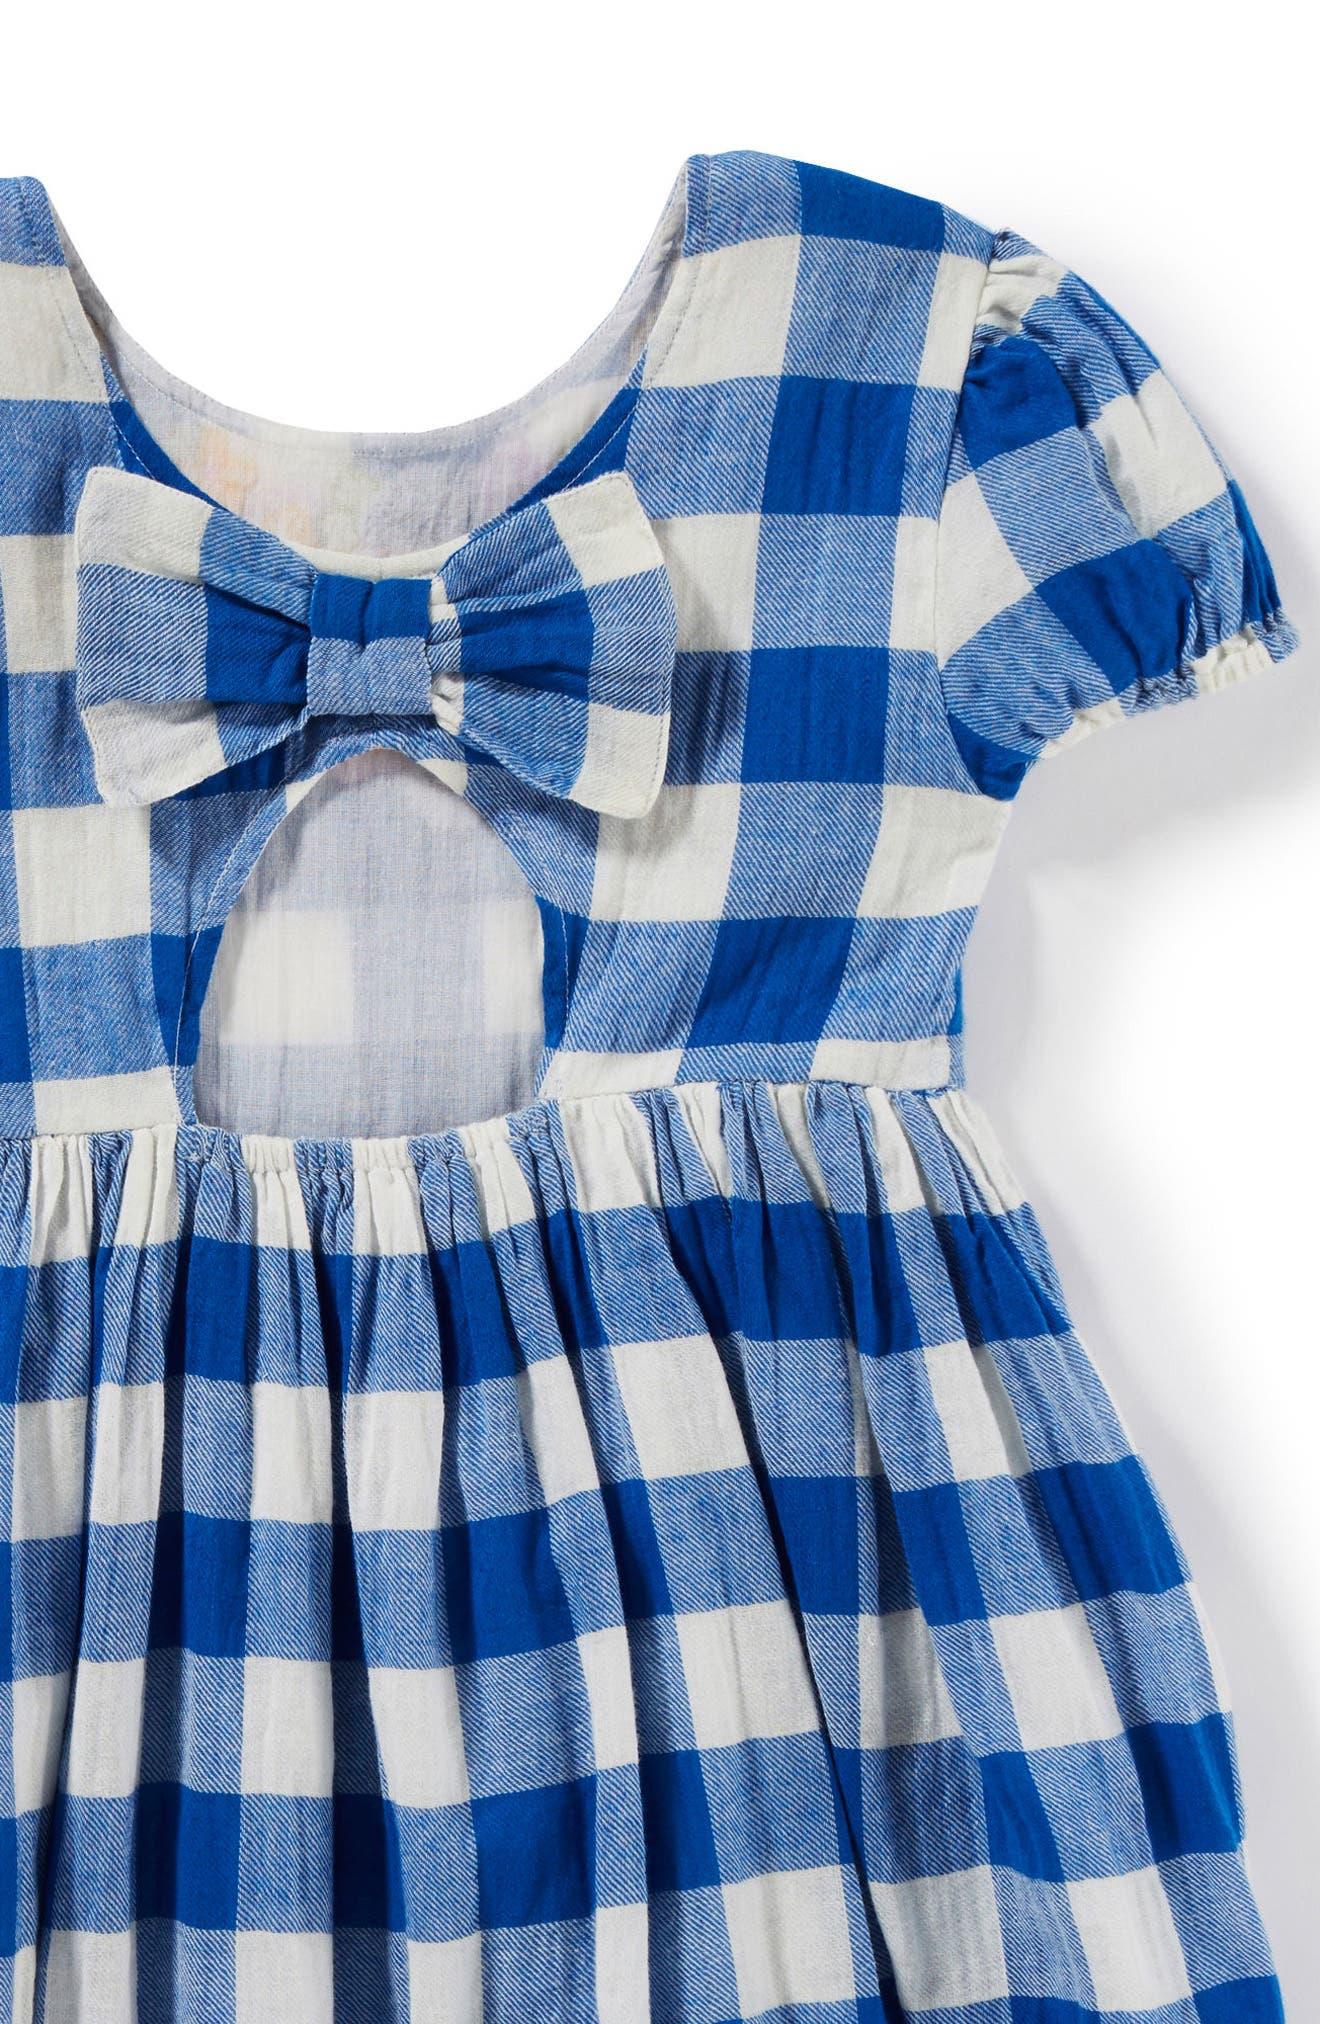 Alternate Image 2  - Peek Penelope Embroidered Check Dress (Toddler Girls, Little Girls & Big Girls)